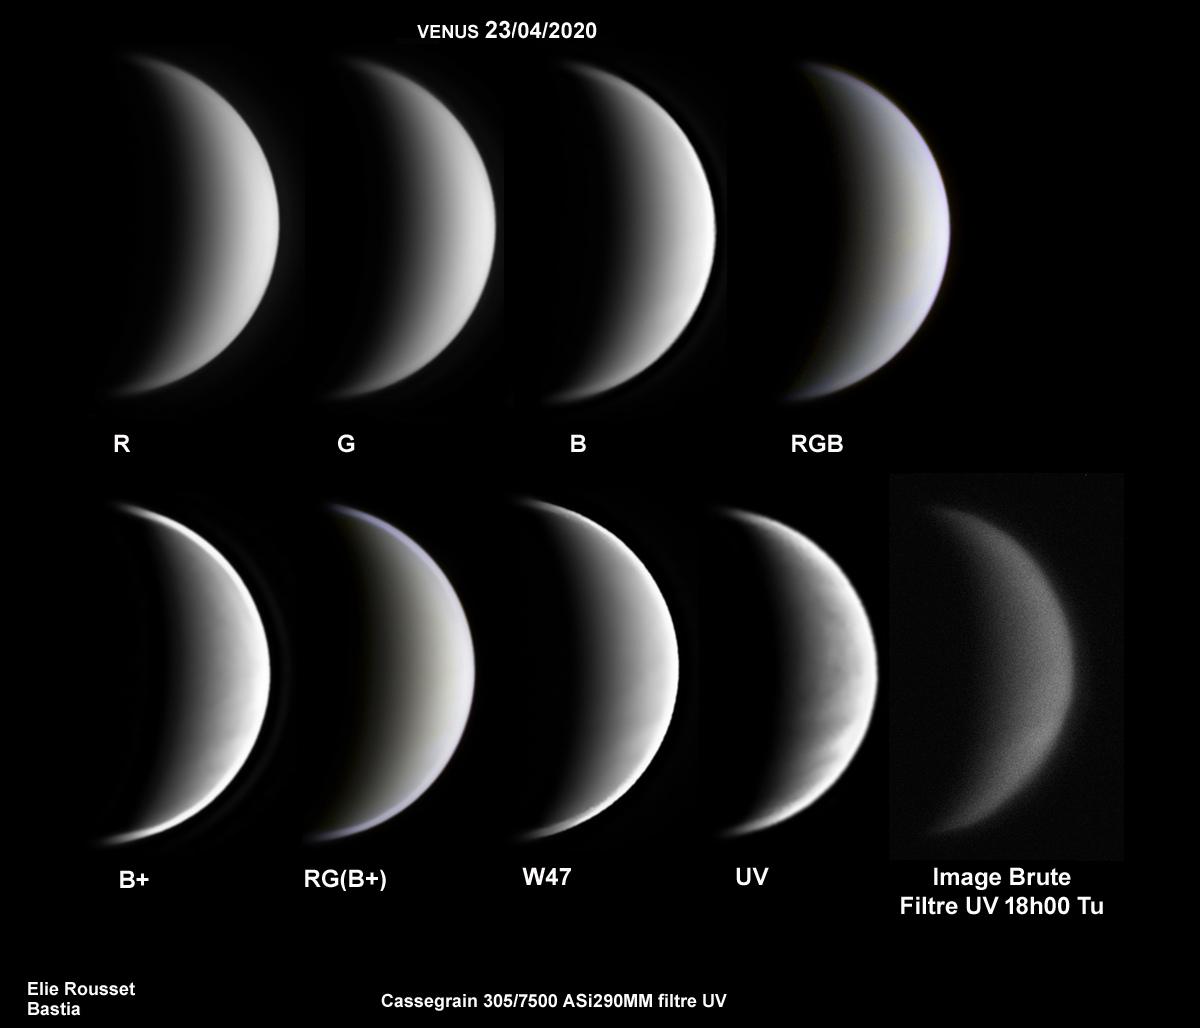 large.VENUS-23-04-2020-3eme-planc.jpg.d5a7019cf5f68f30f6ea6d7d74901529.jpg